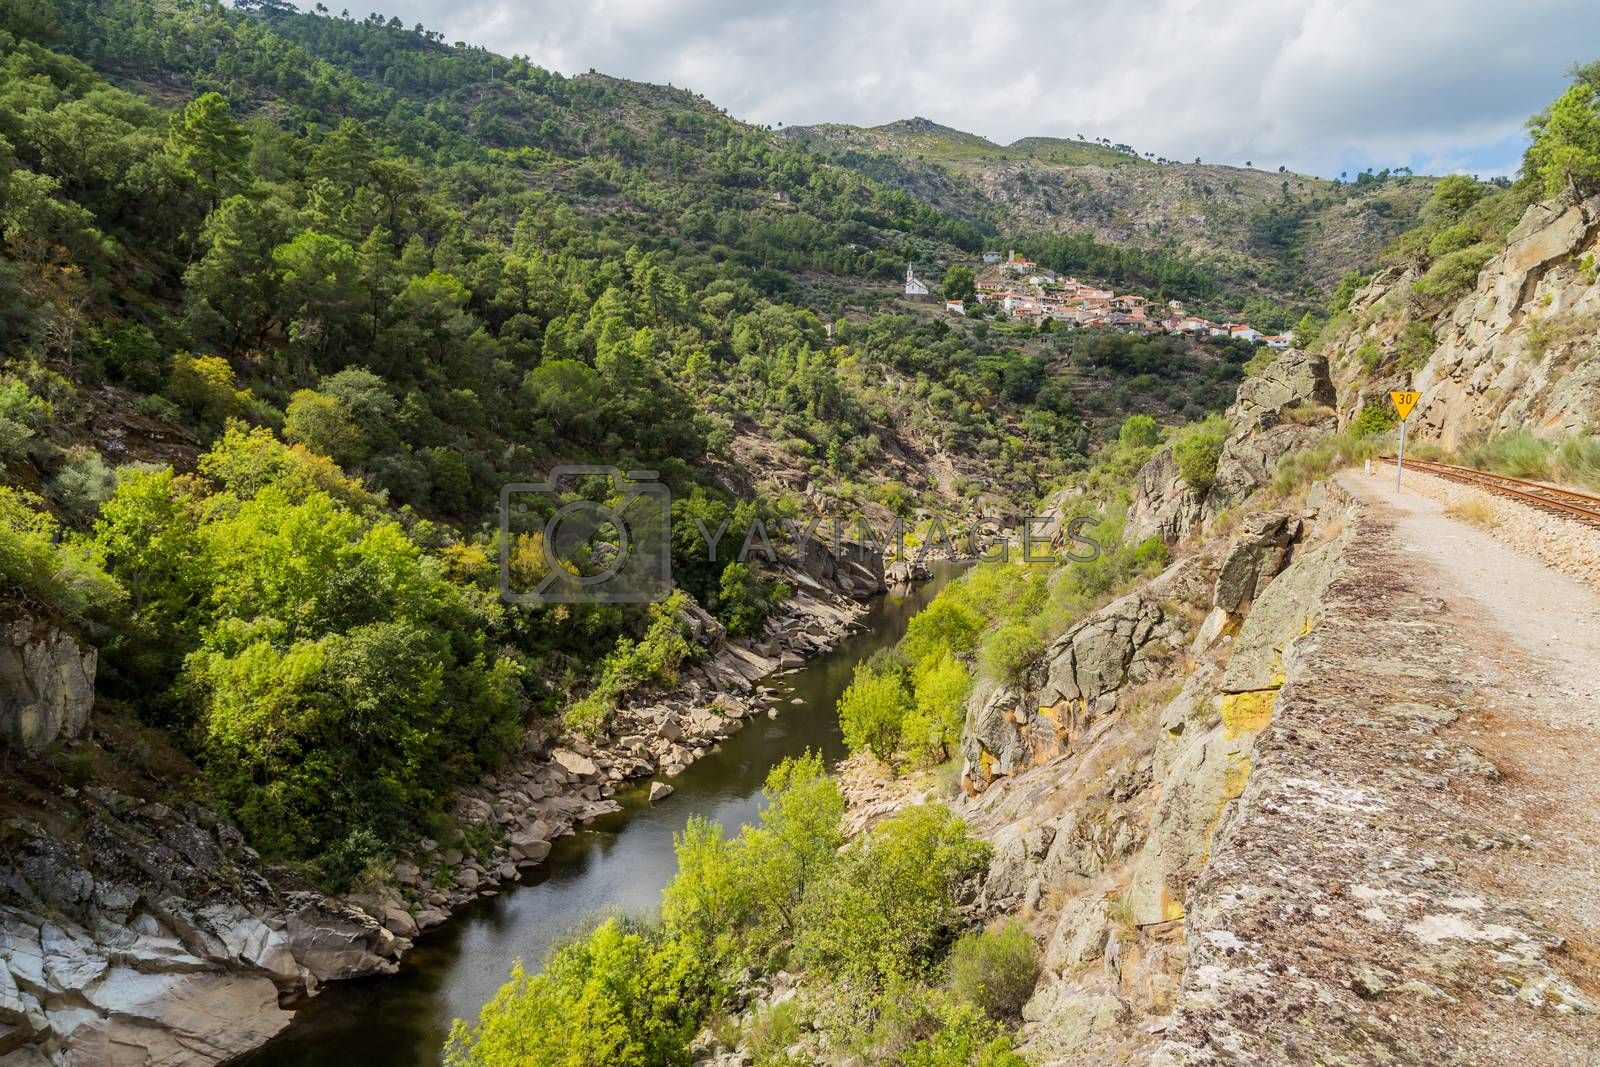 River Tua in the mountains of Douro, Portugal